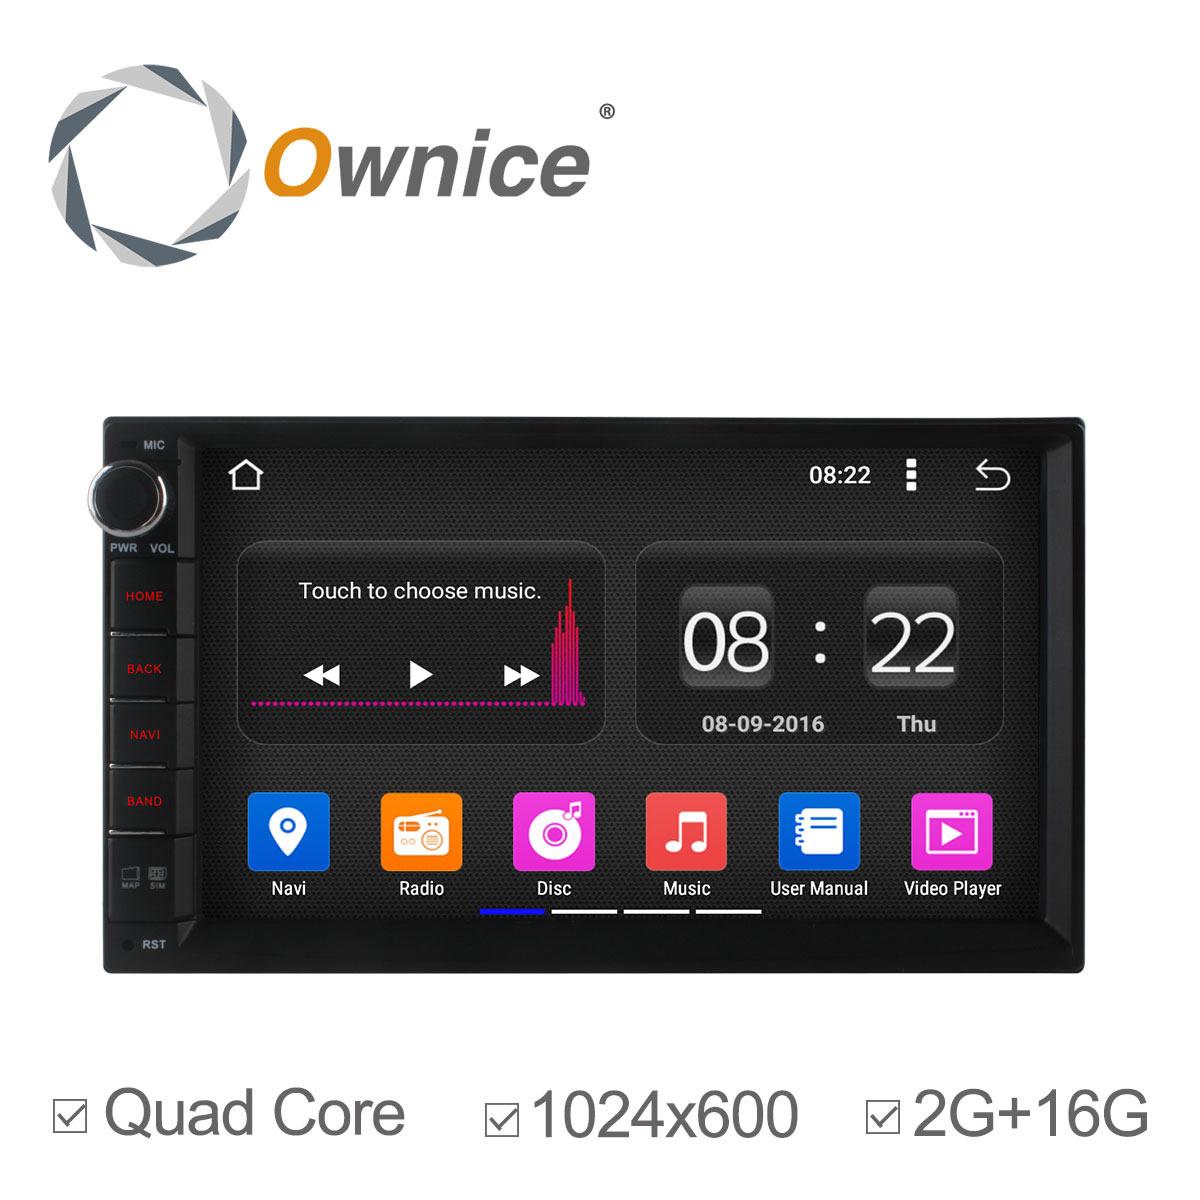 imágenes para Ownice 2 din android 5.1 de cuatro núcleos universal car radio dvd gps Navi 2G ram/16G rom Bluetooth de la Ayuda 3G DVR Cámara wifi no dvd